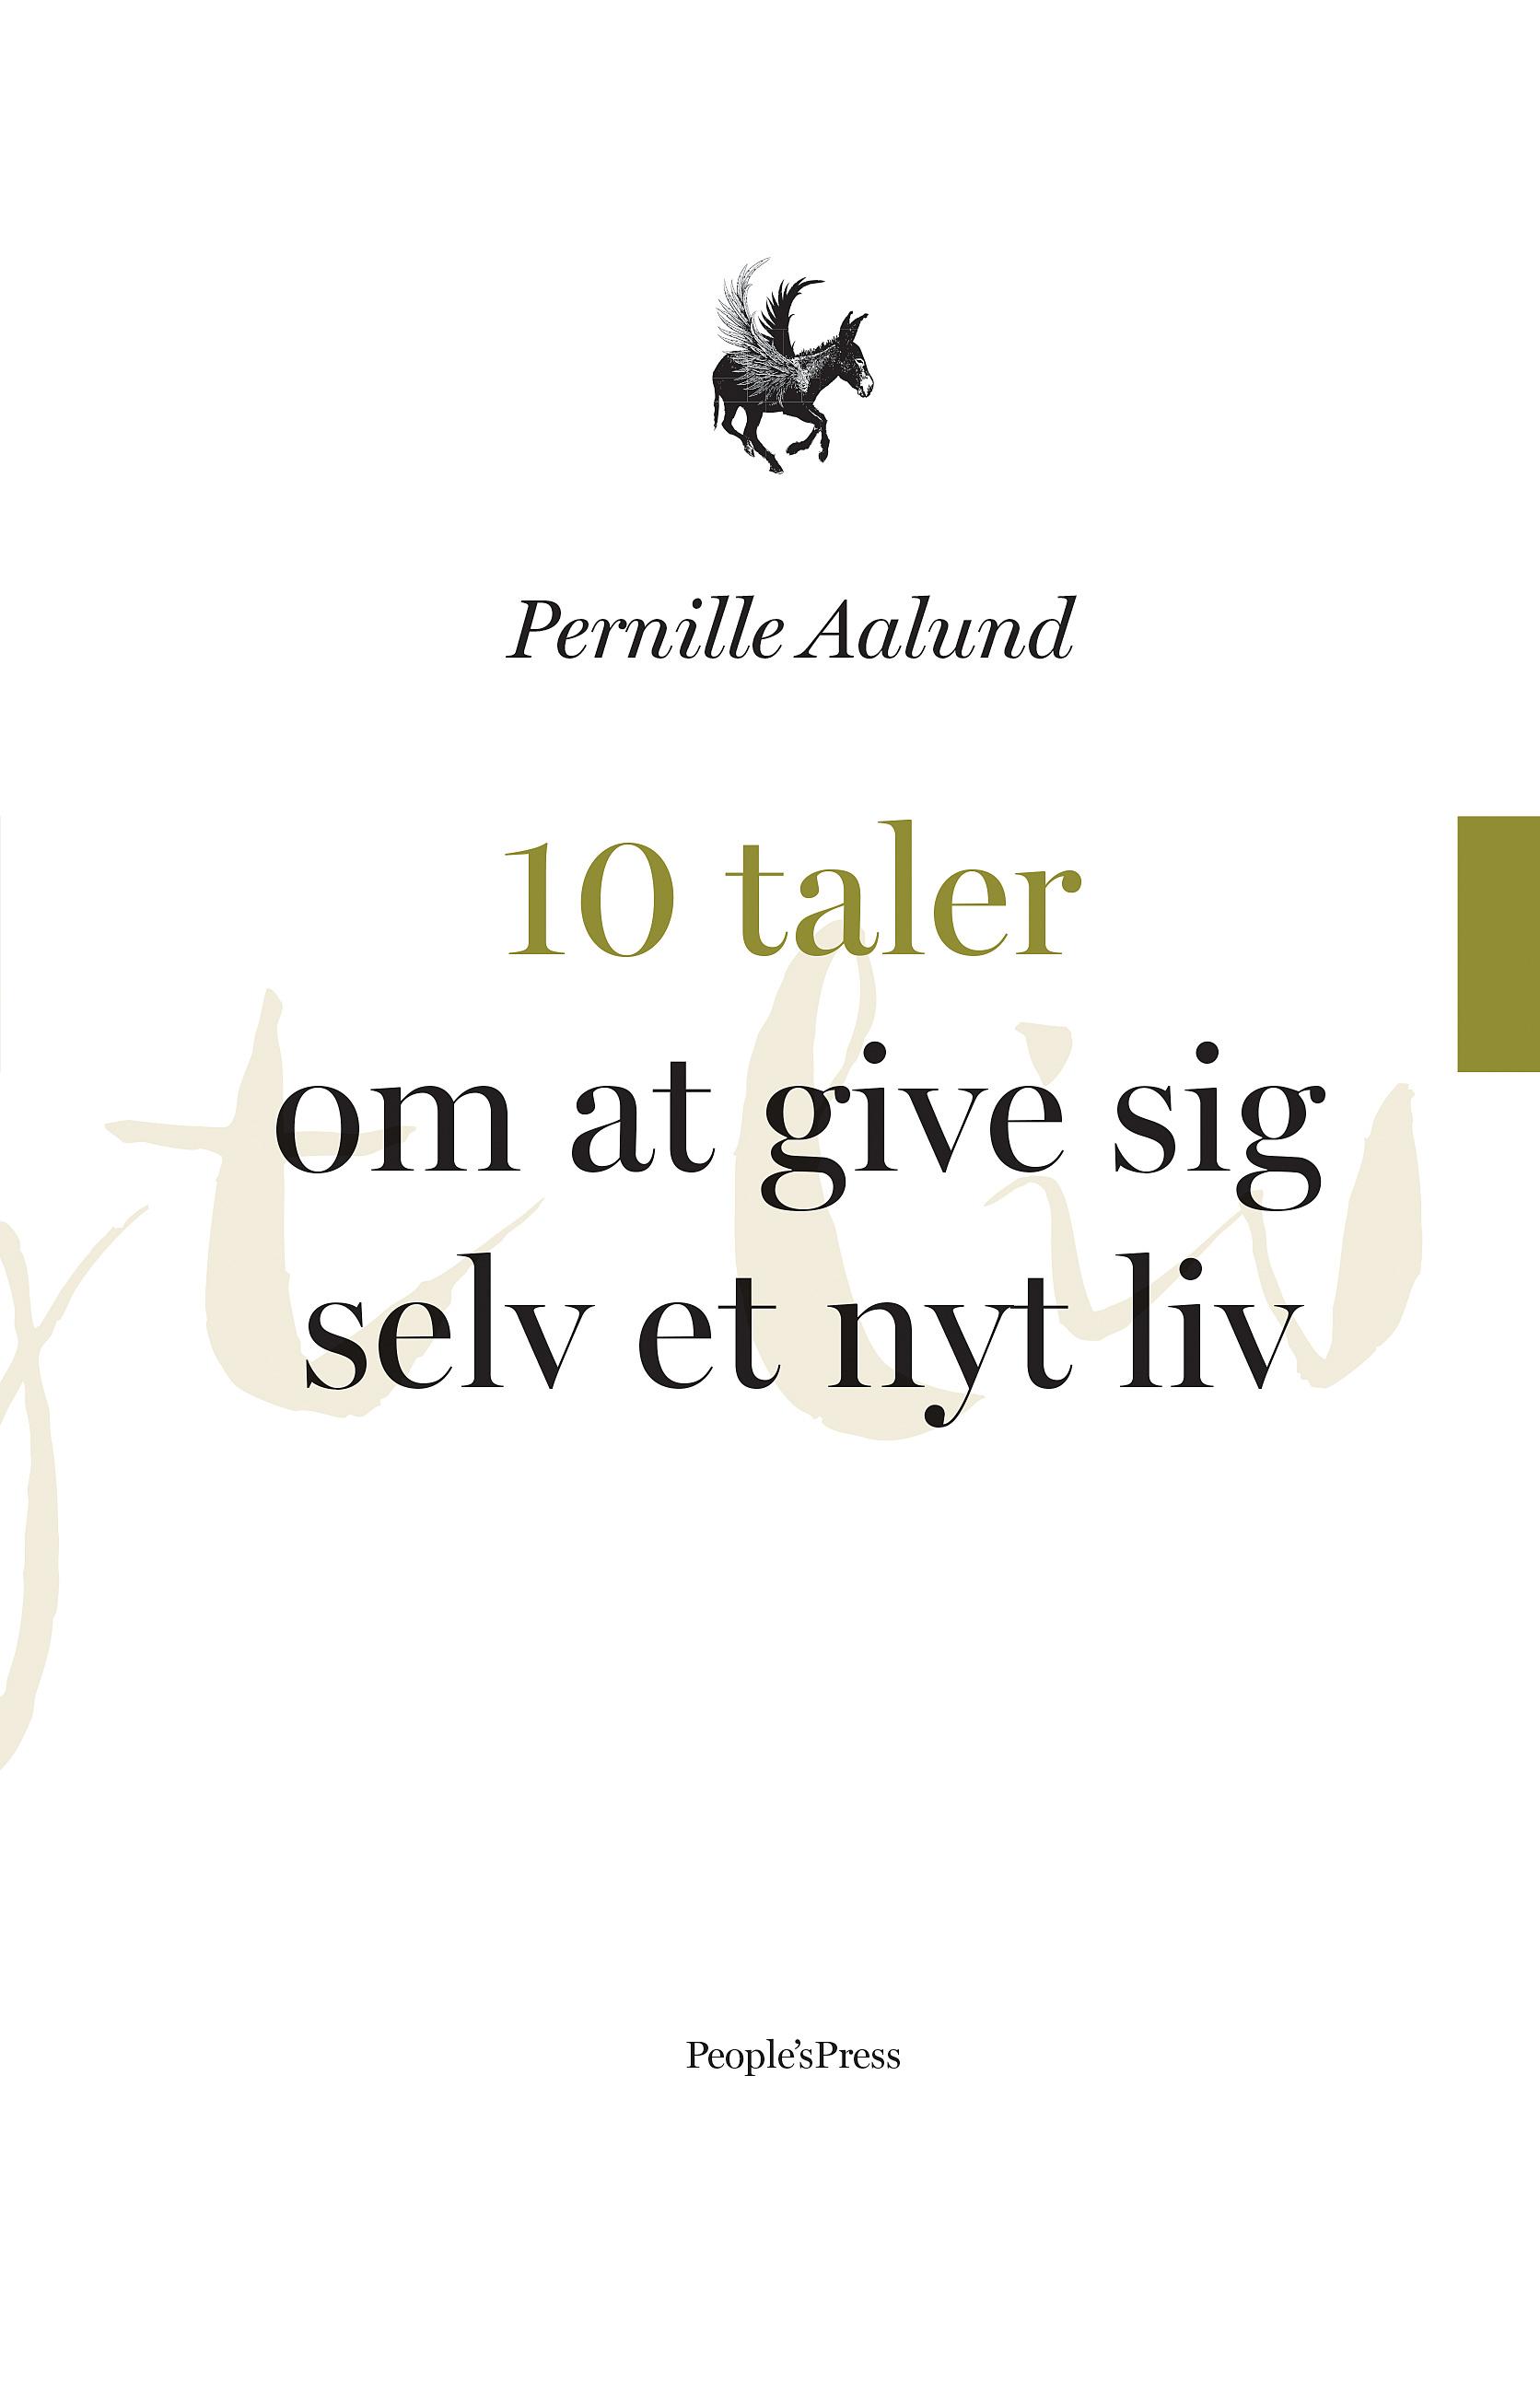 Pernille_Aalund_10_taler_Nyt_liv